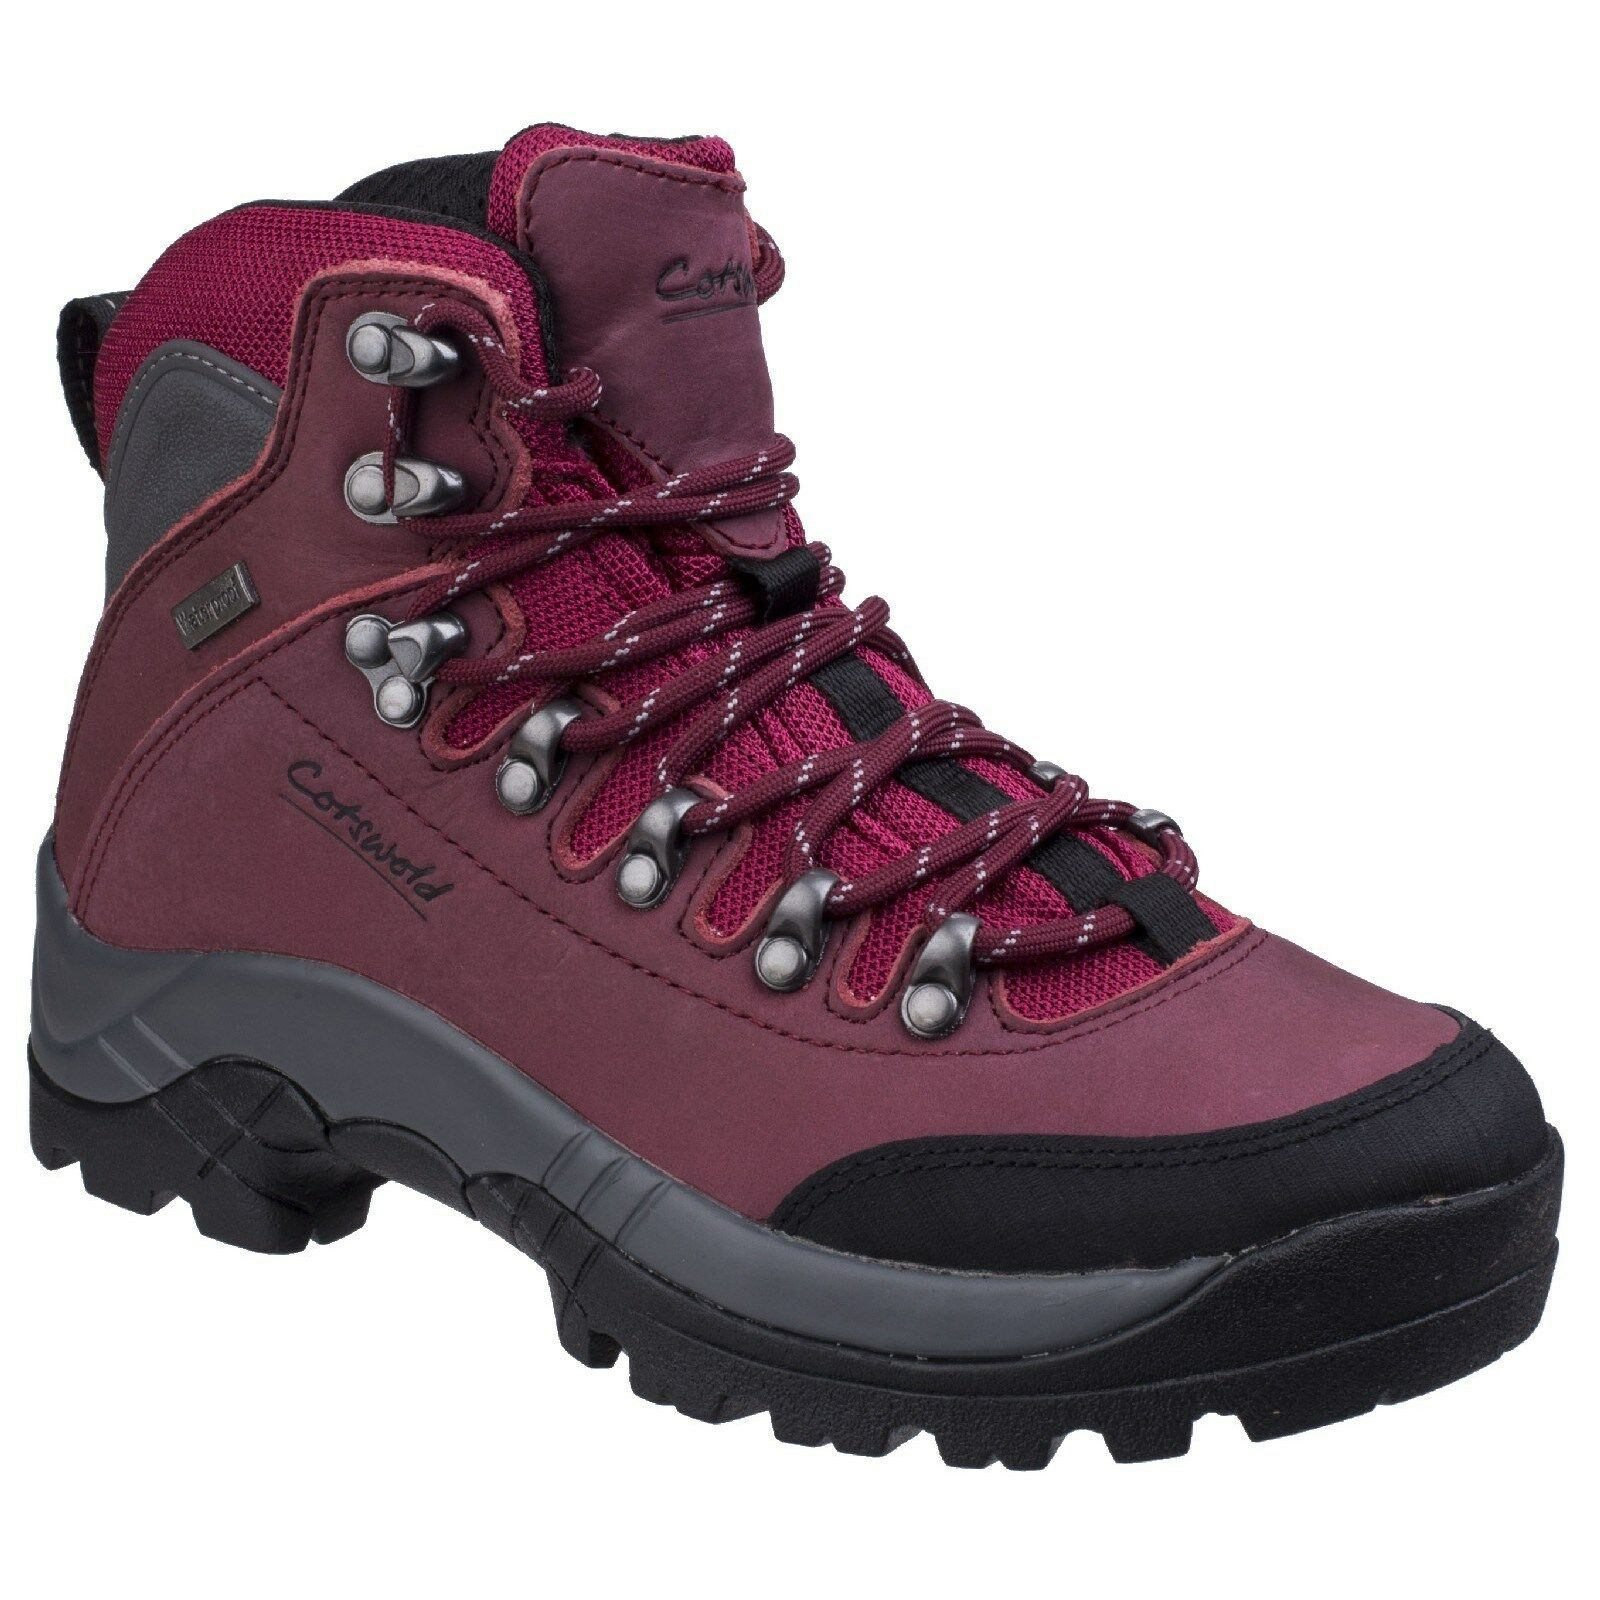 Cotswold WESTONBIRT Donna ESCURSIONISTA Rosso Pelle Trekking Stivali Impermeabili Da Passeggio Trekking Pelle 9ed611